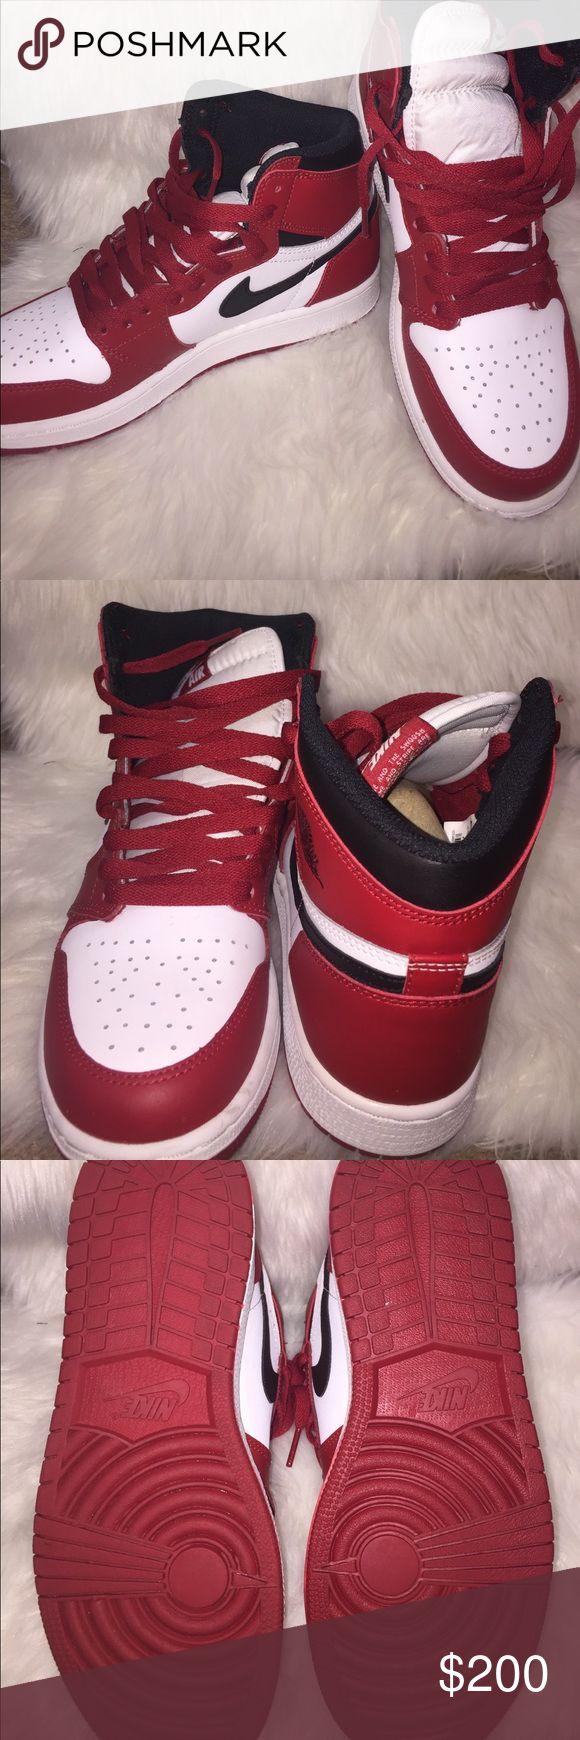 Nike Retro OG's Red, black and white Jordan Retros Nike Shoes Sneakers